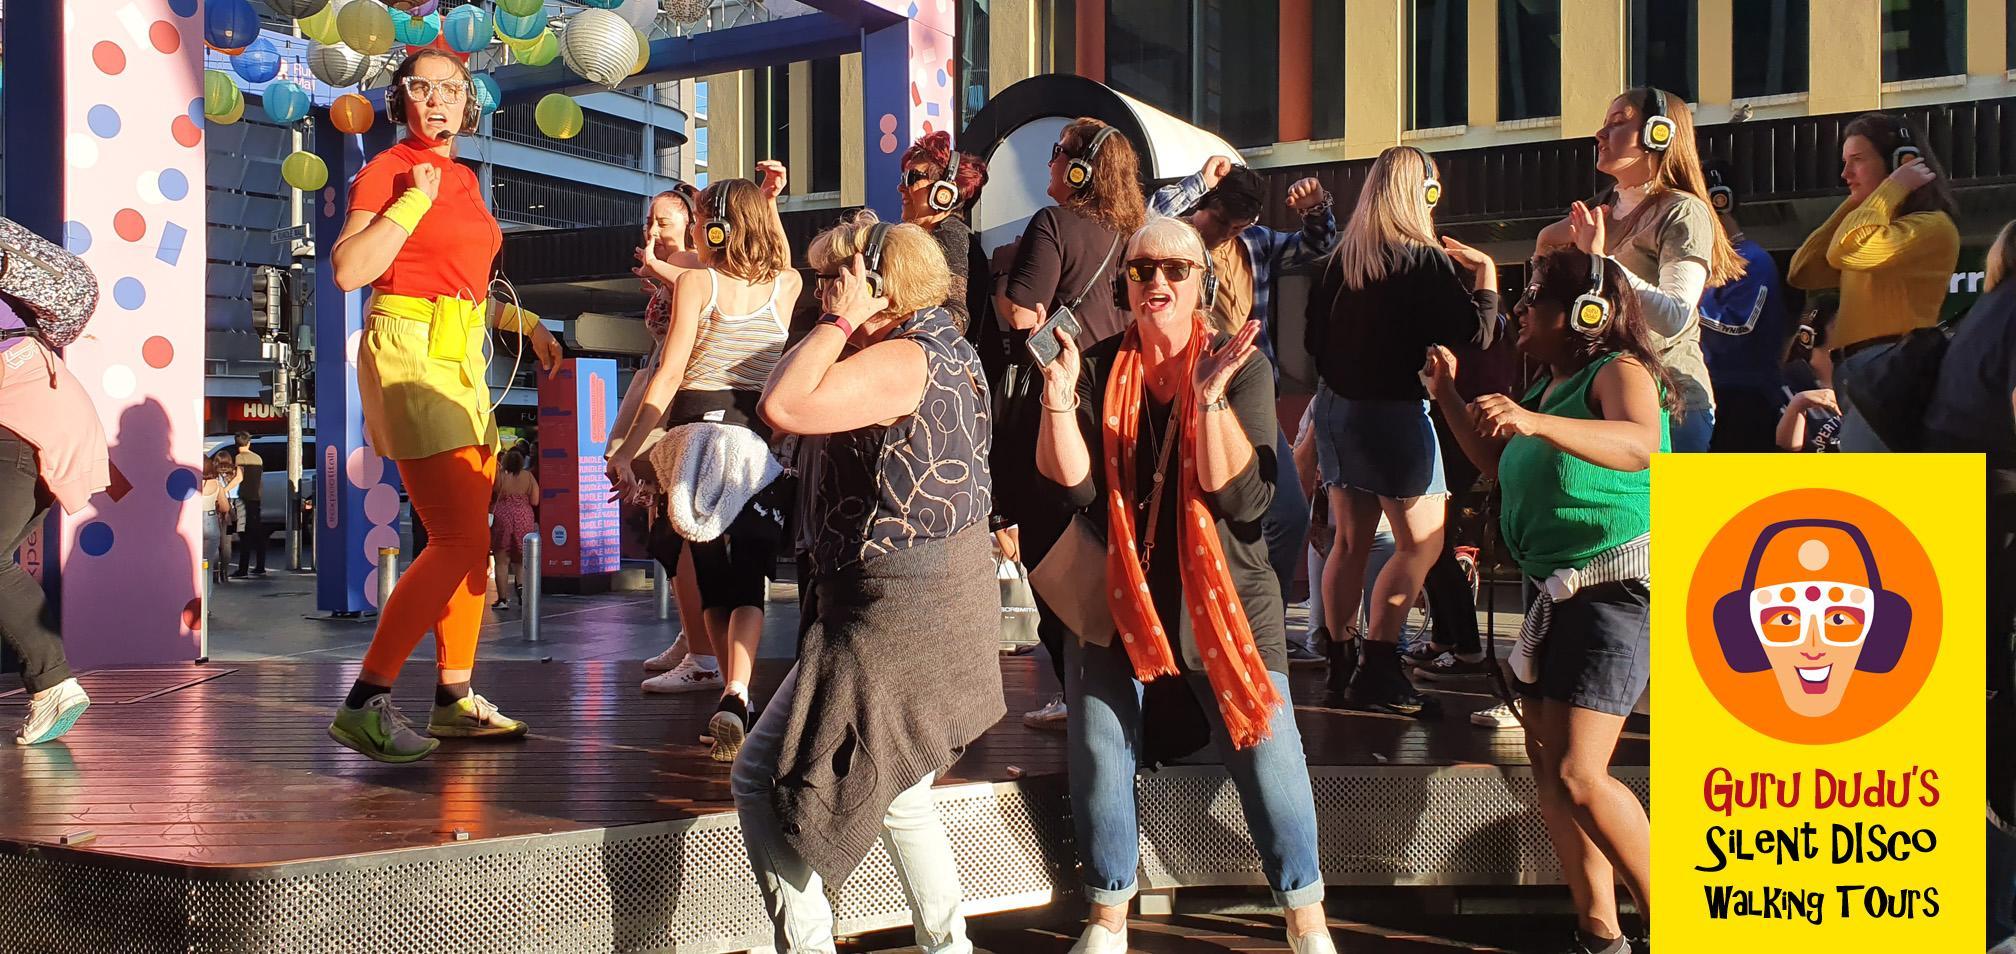 Guru Dudu's Silent Disco Walking Tour of Adelaide - April 3